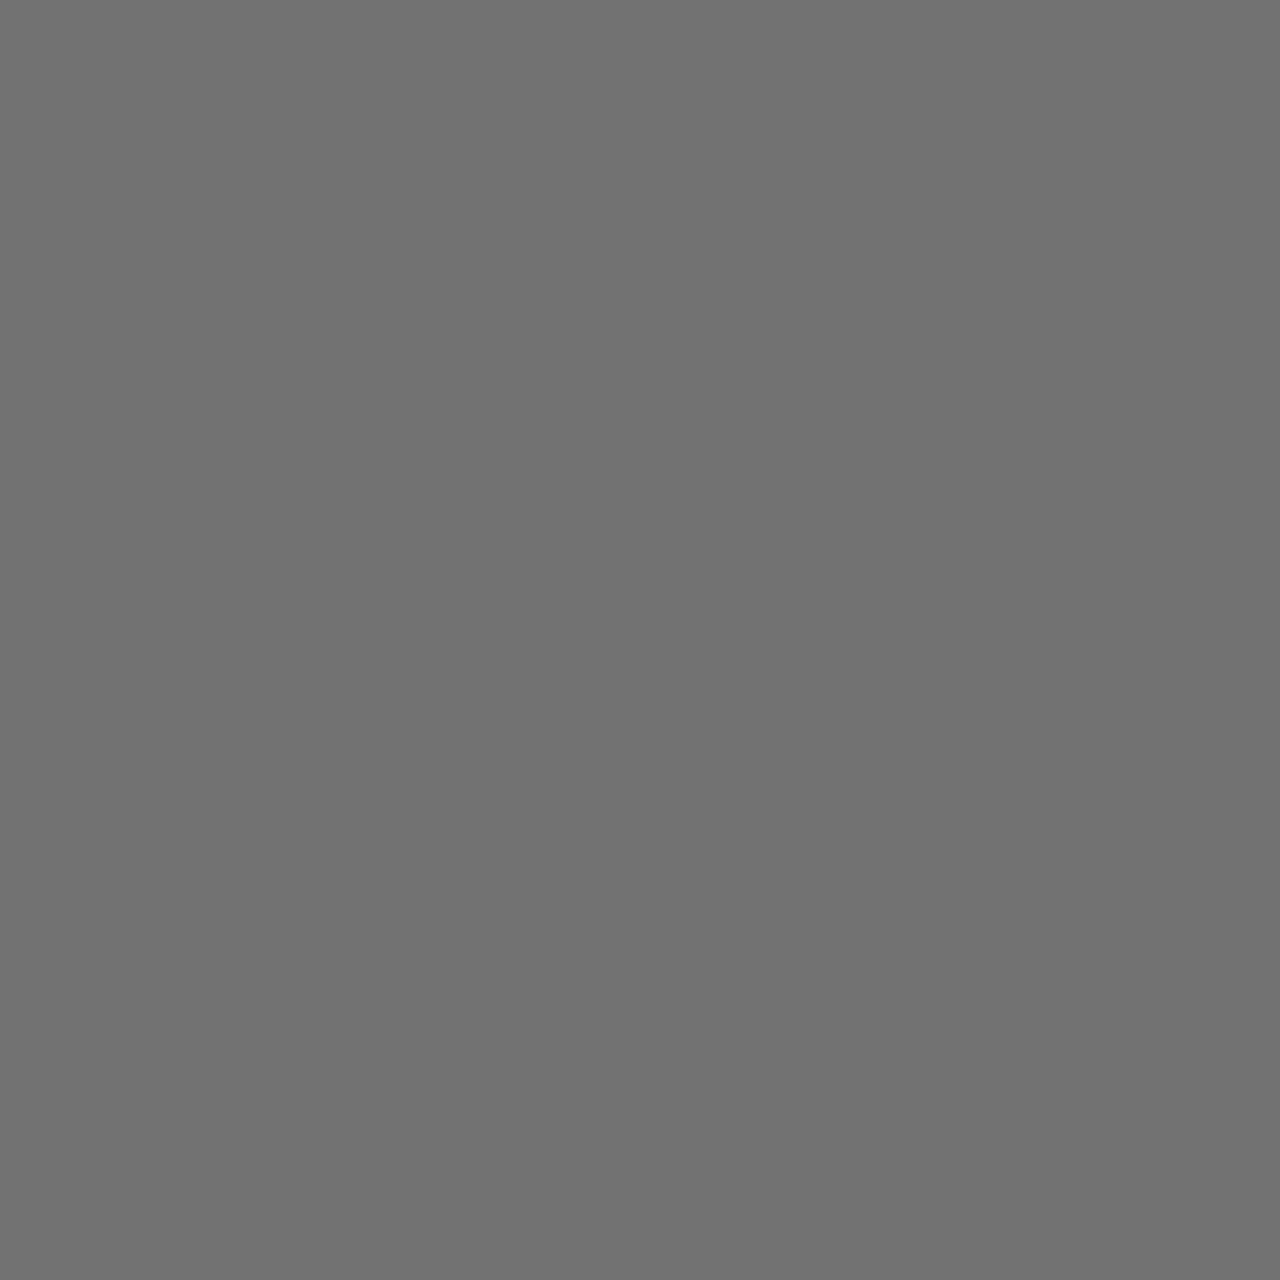 "SUPERIOR SEAMLESS PAPER BACKGROUND 53""X36' - NEUTRAL GREY"